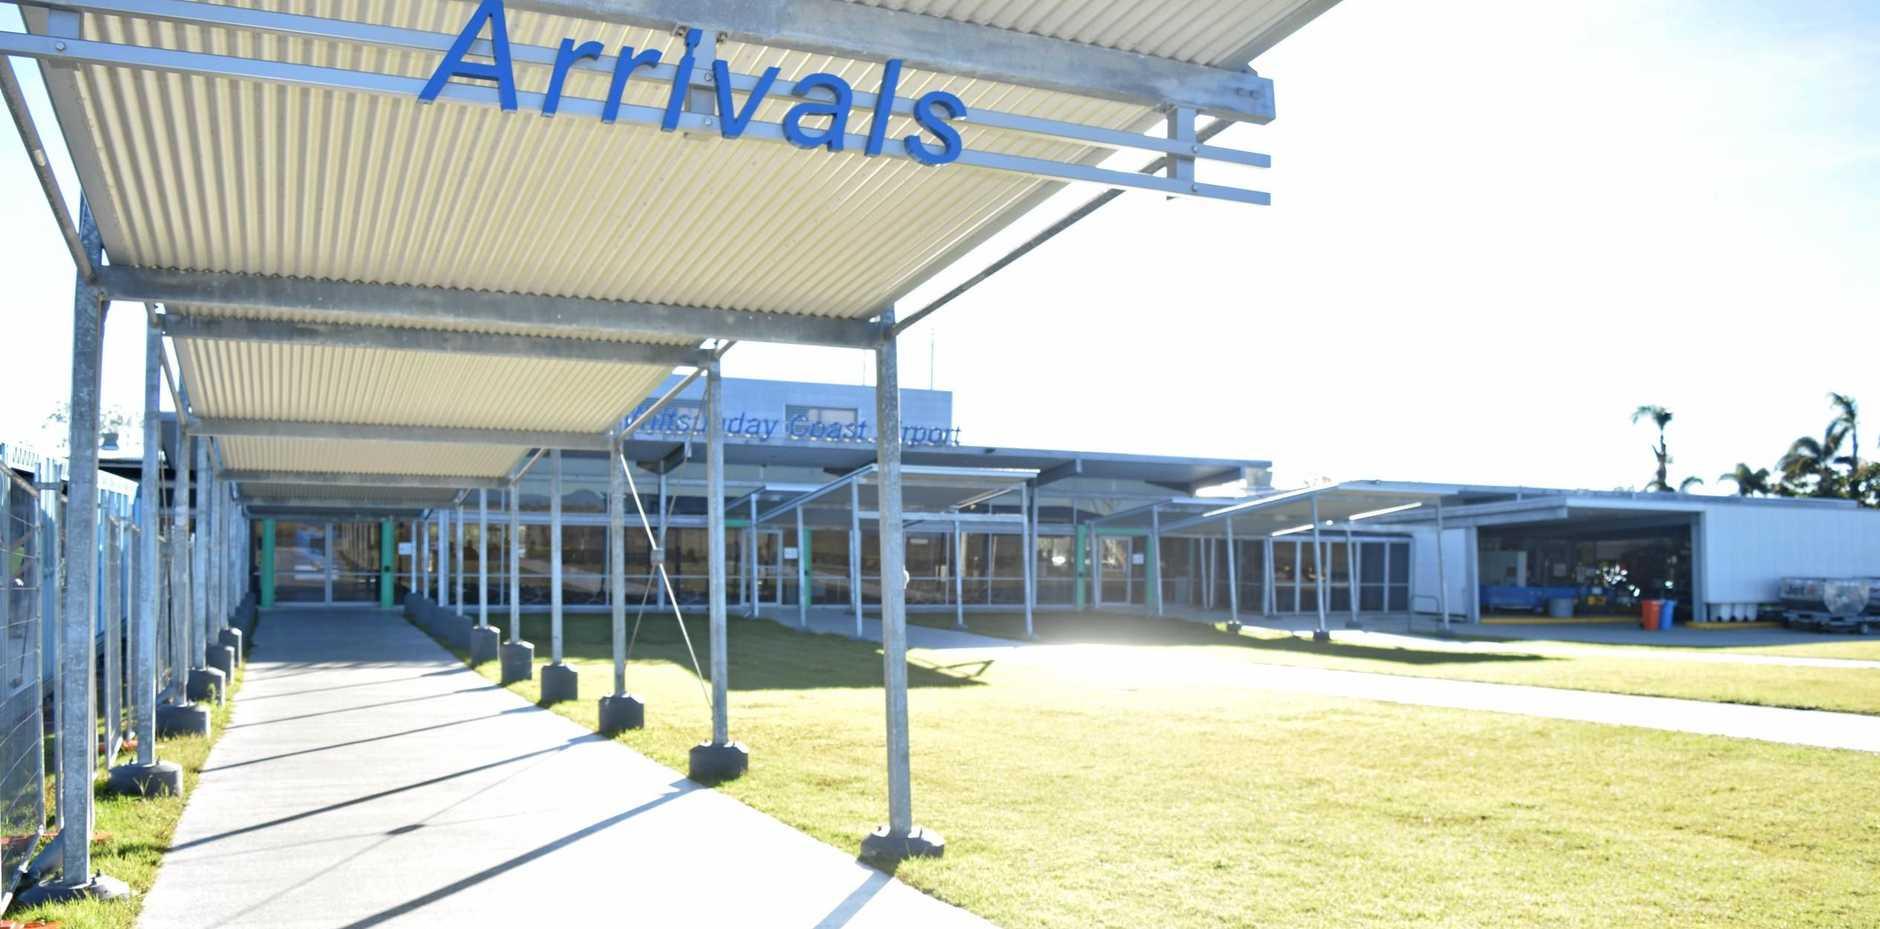 The Whitsunday Coast Airport.